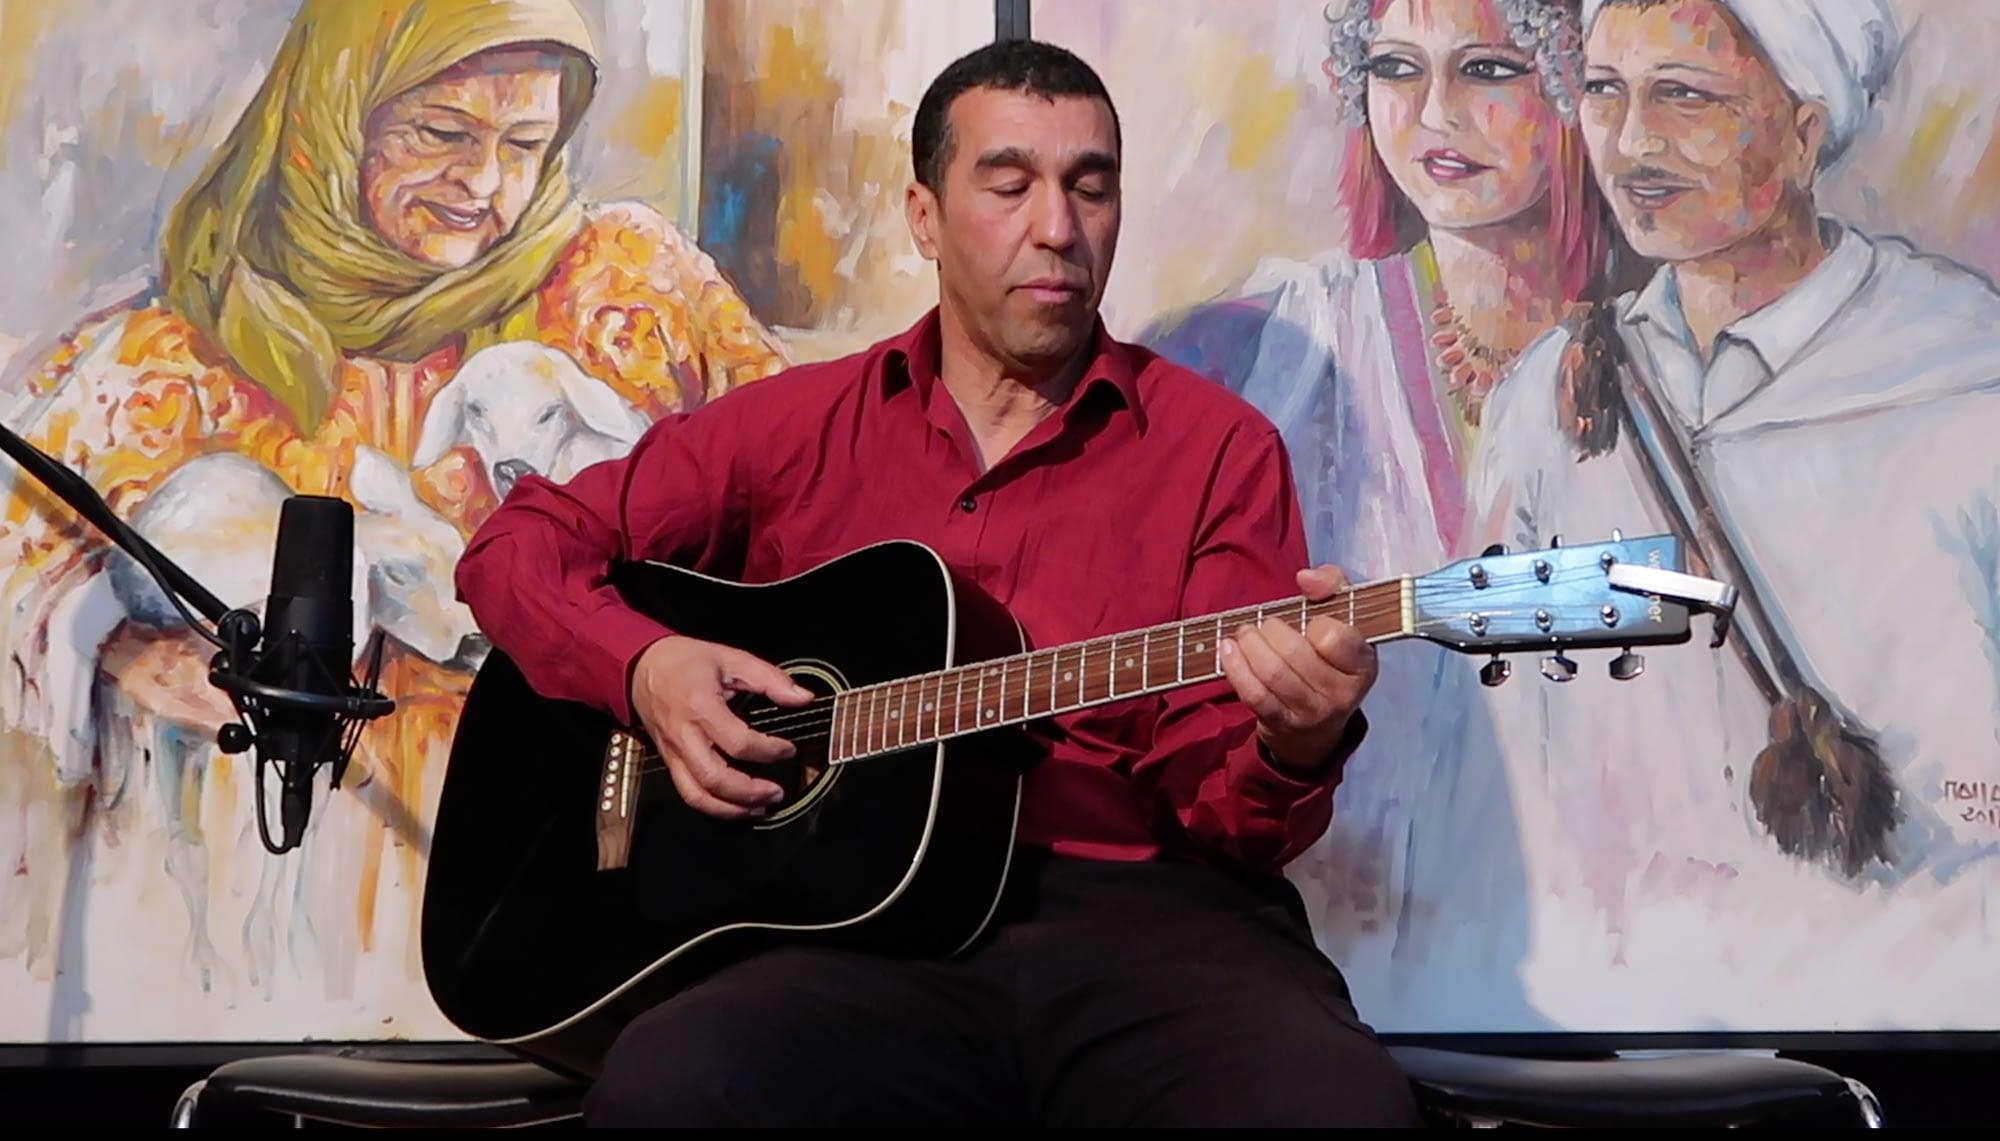 Mo Mallal playing guitar